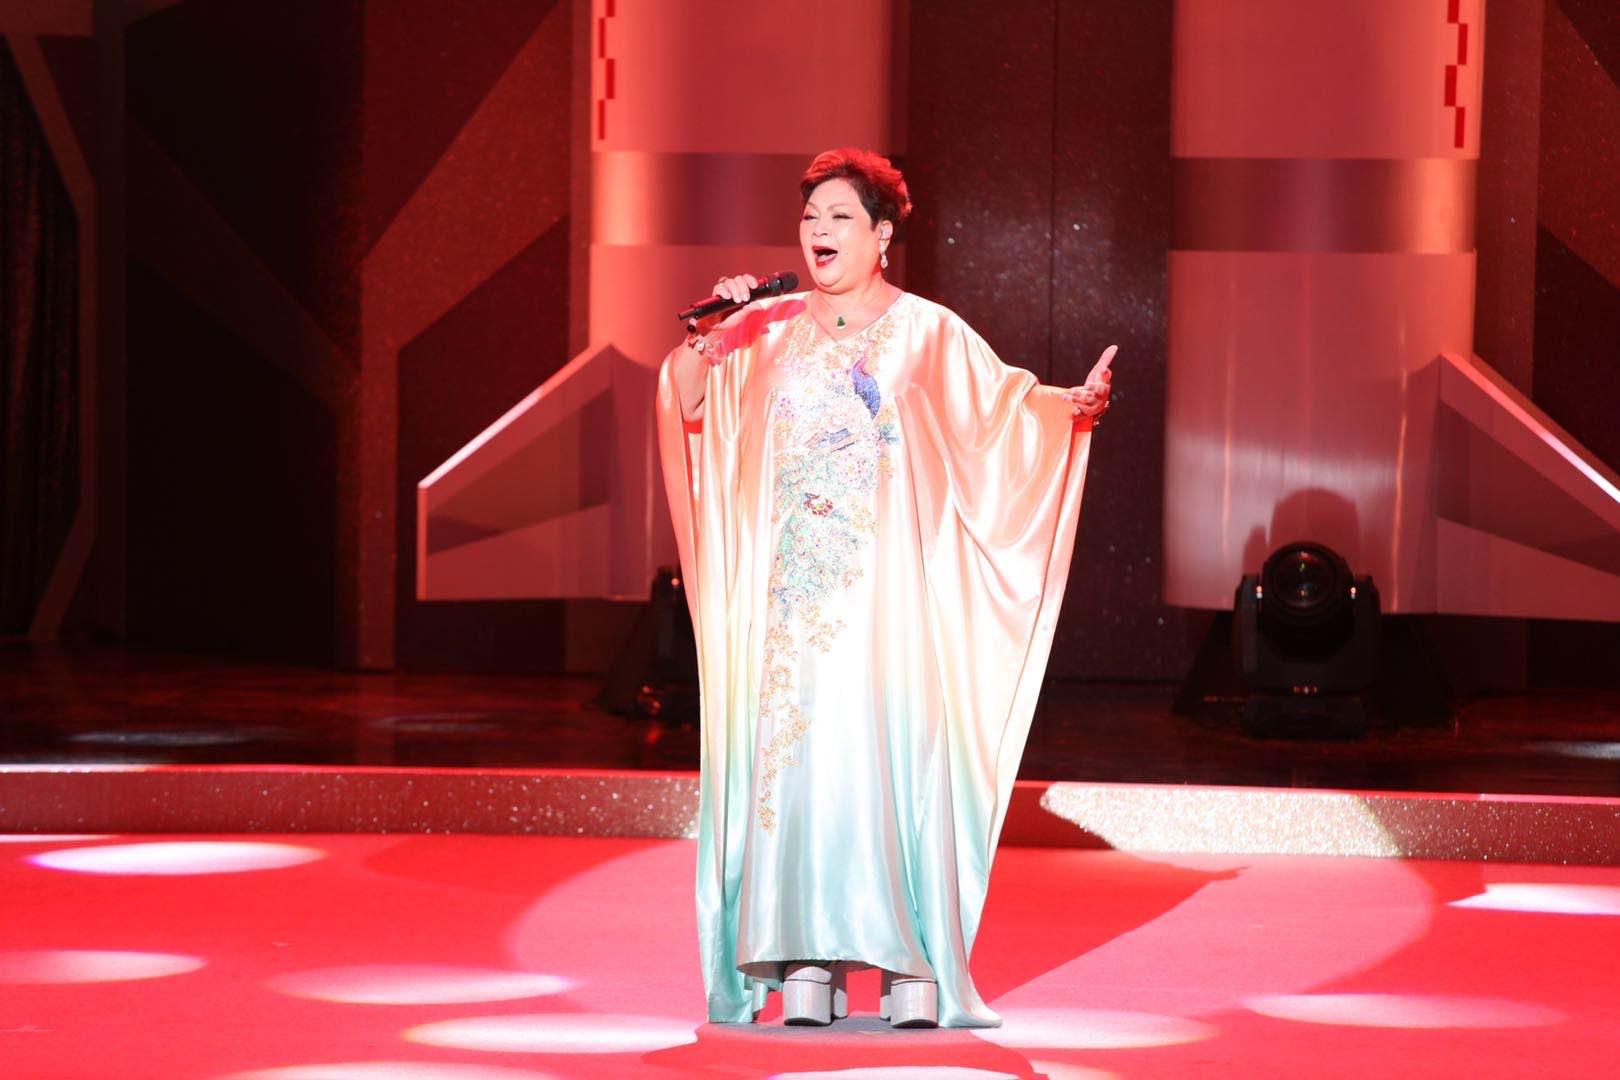 Maria Cordero(肥媽)、胡定欣、葉振棠等歌手及團體獻唱。(大公文匯全媒體記者攝)